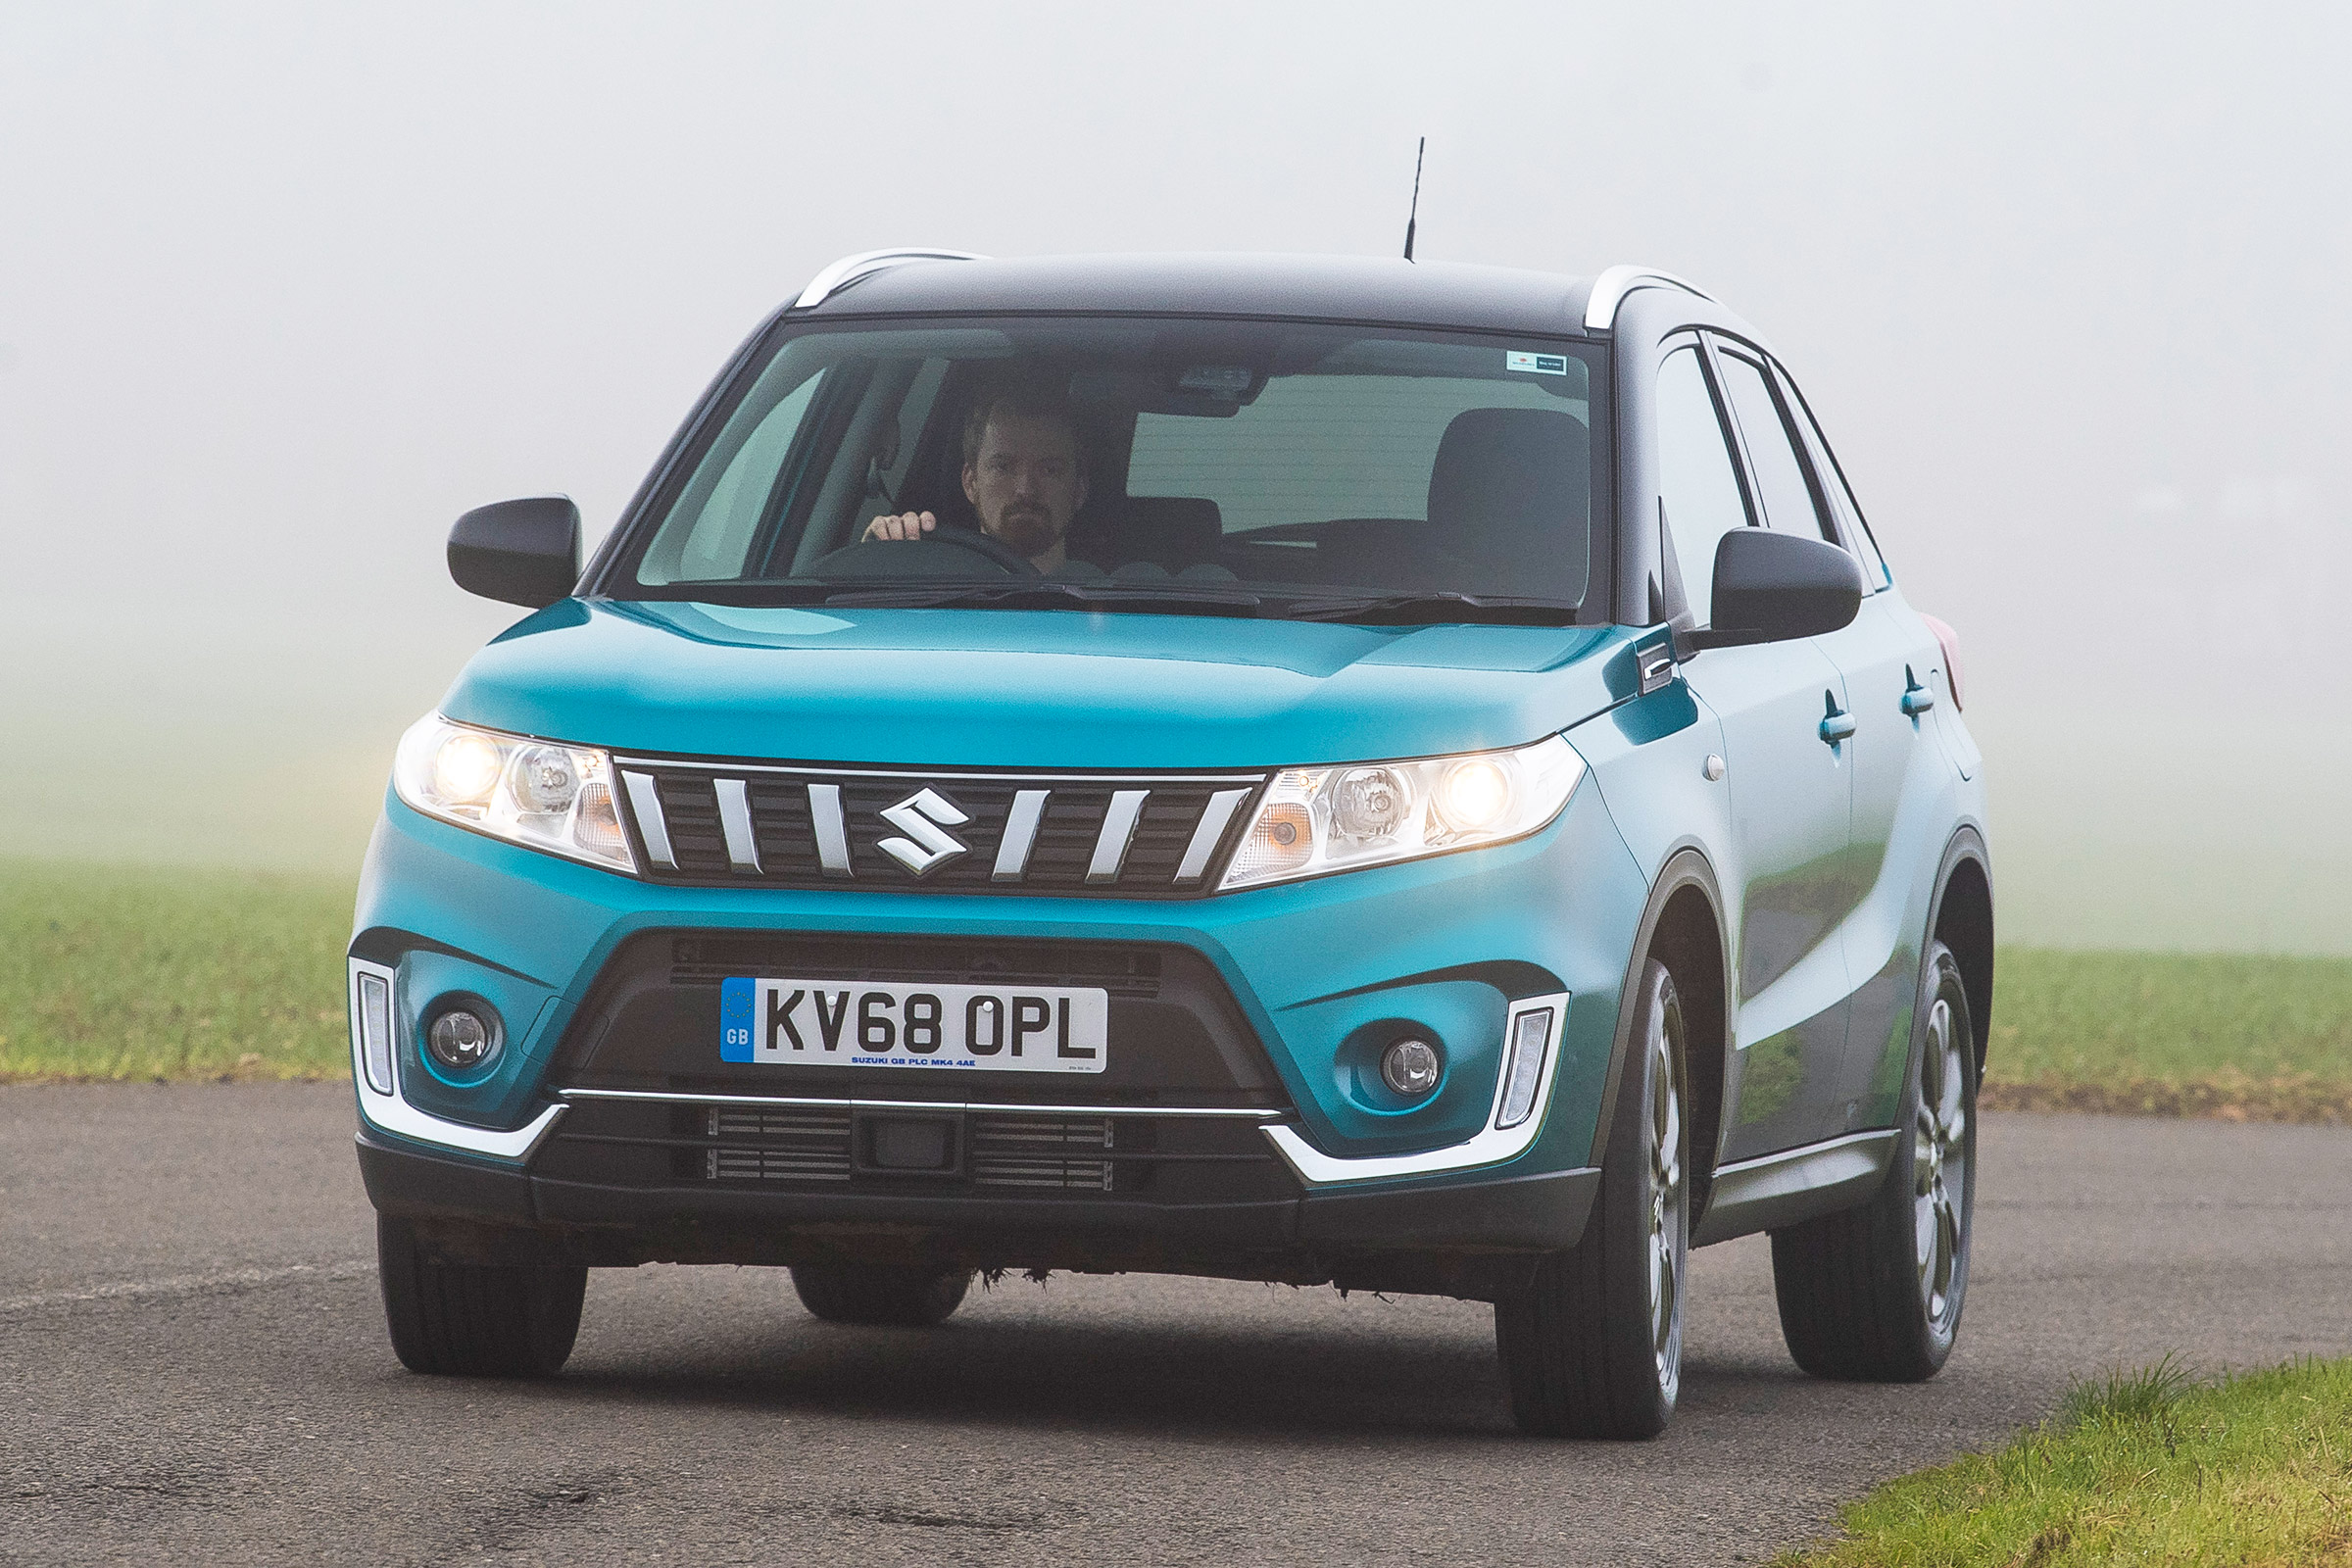 Honda City 2019 Price In Pakistan Review Full Specs Images